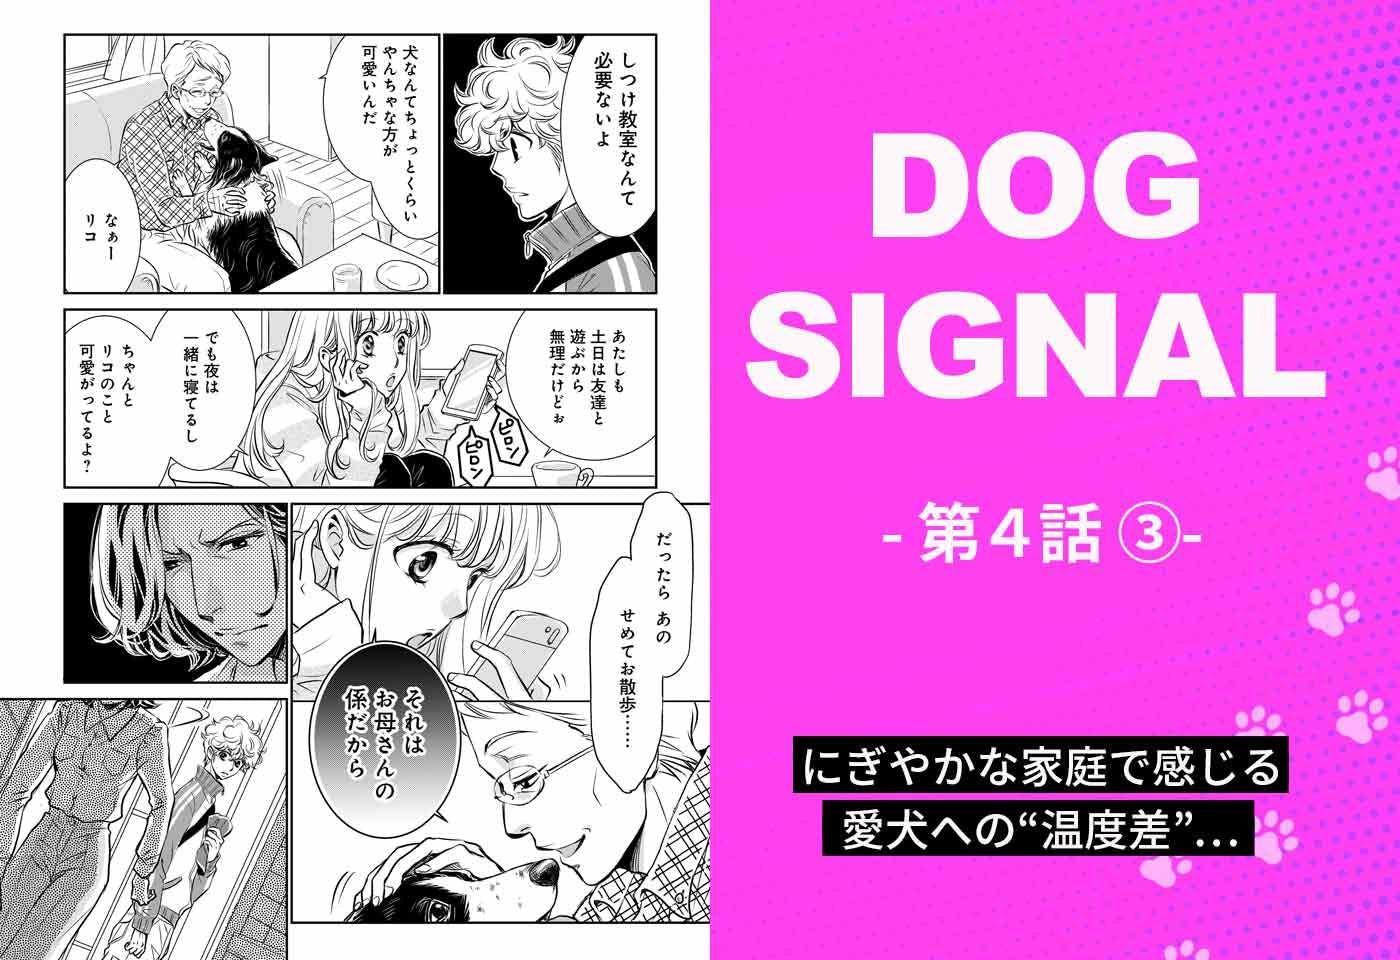 『DOG SIGNAL』4話目 3/4